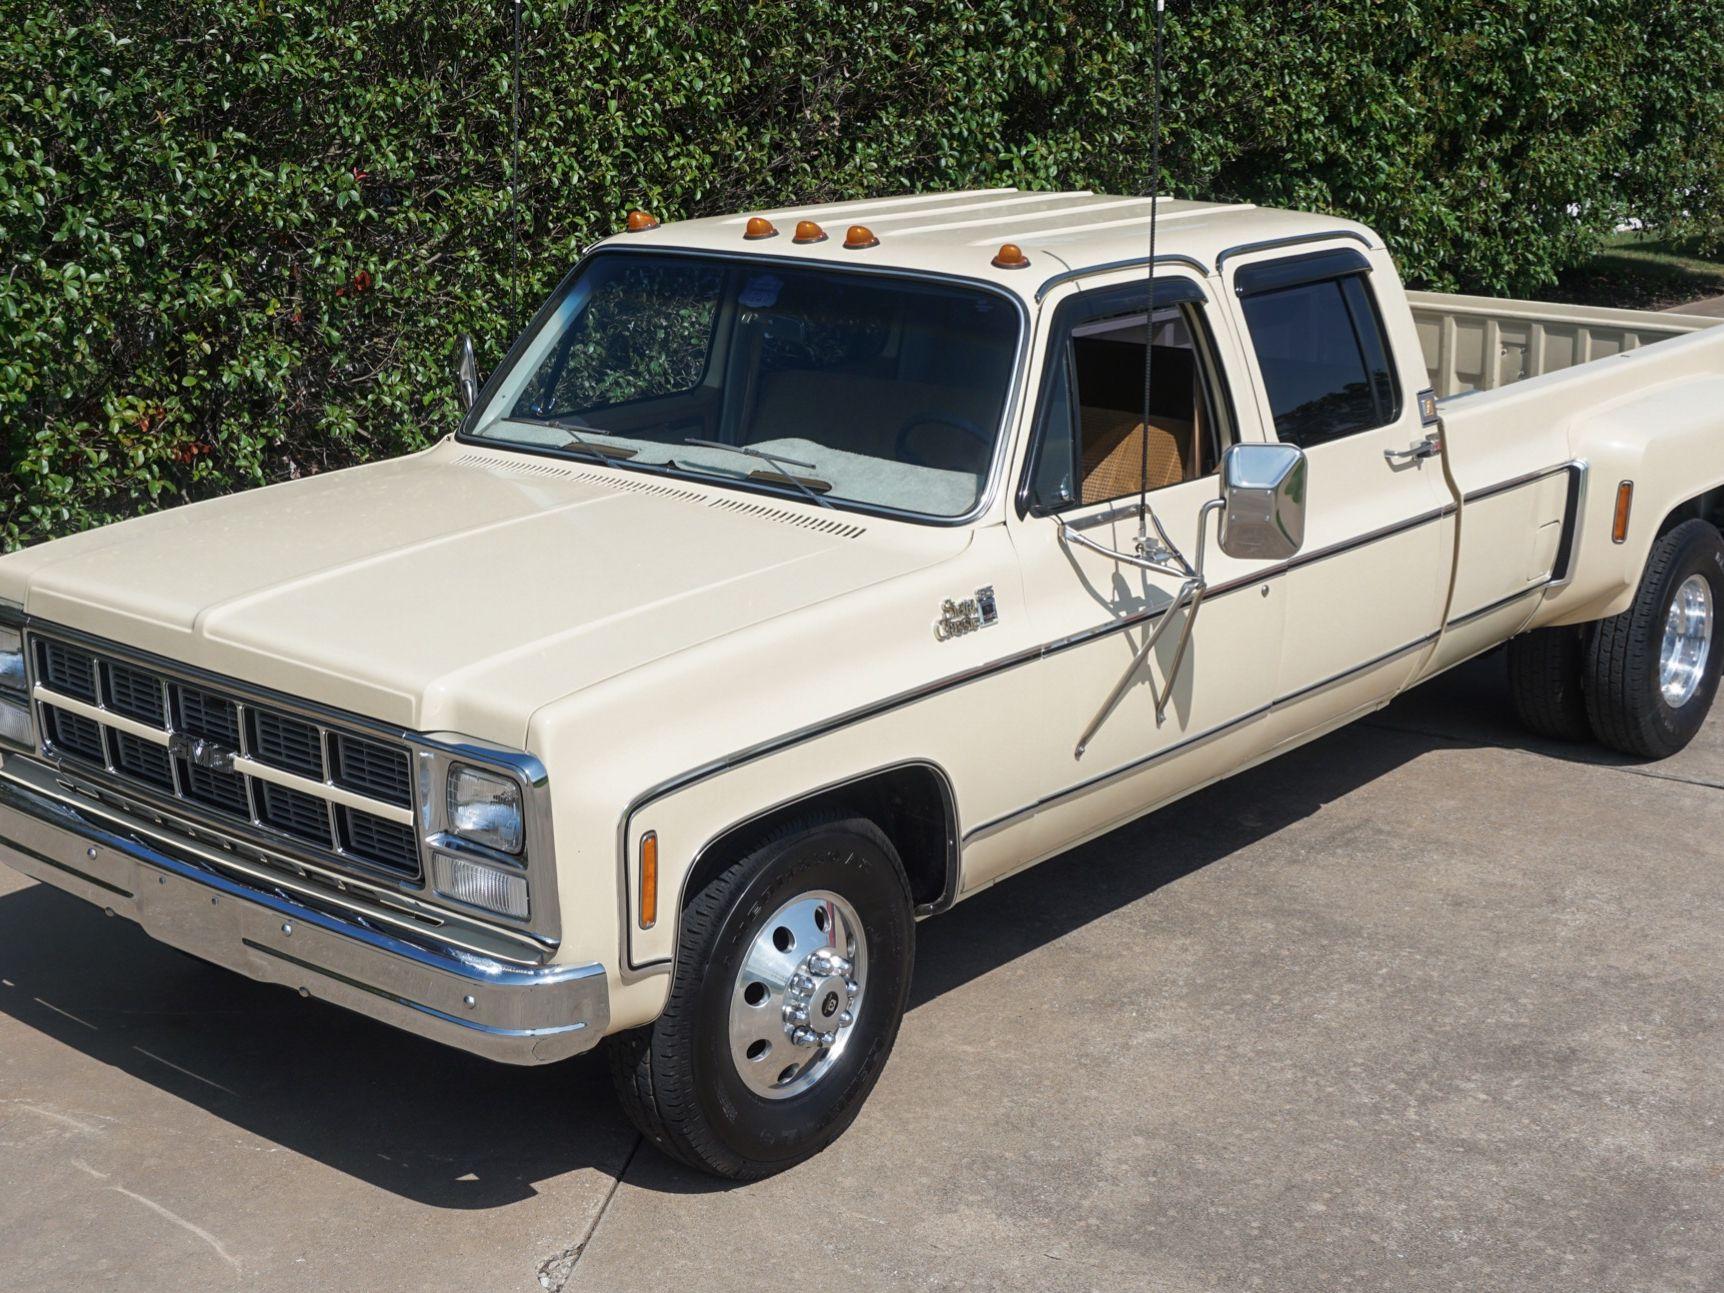 1980 GMC C3500 Sierra Classic Camper Special Crew Cab 454 4-Speed